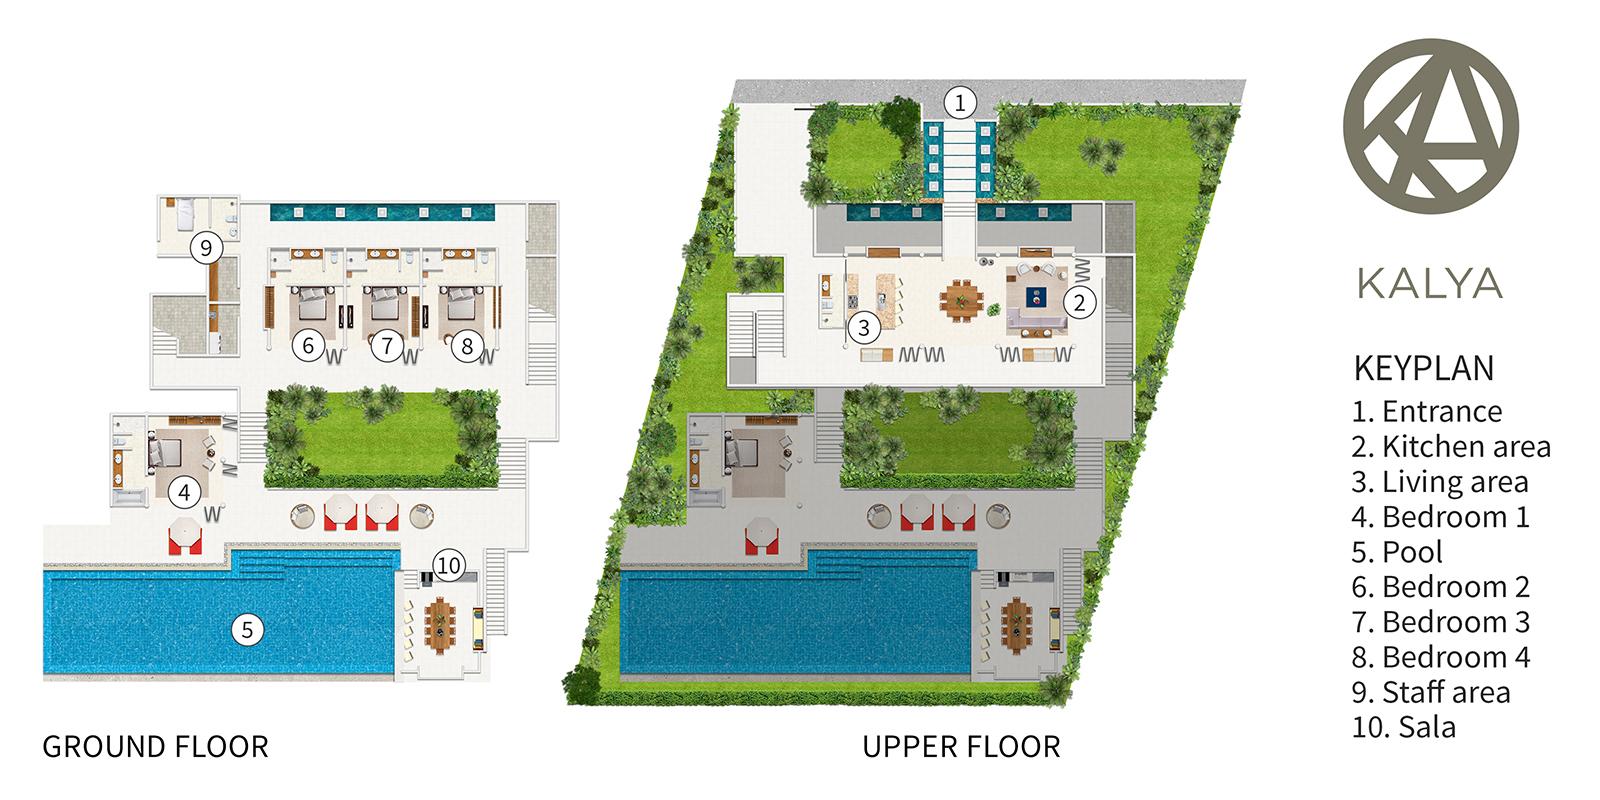 Kalya Residence Floor Plan | Bophut, Koh Samui